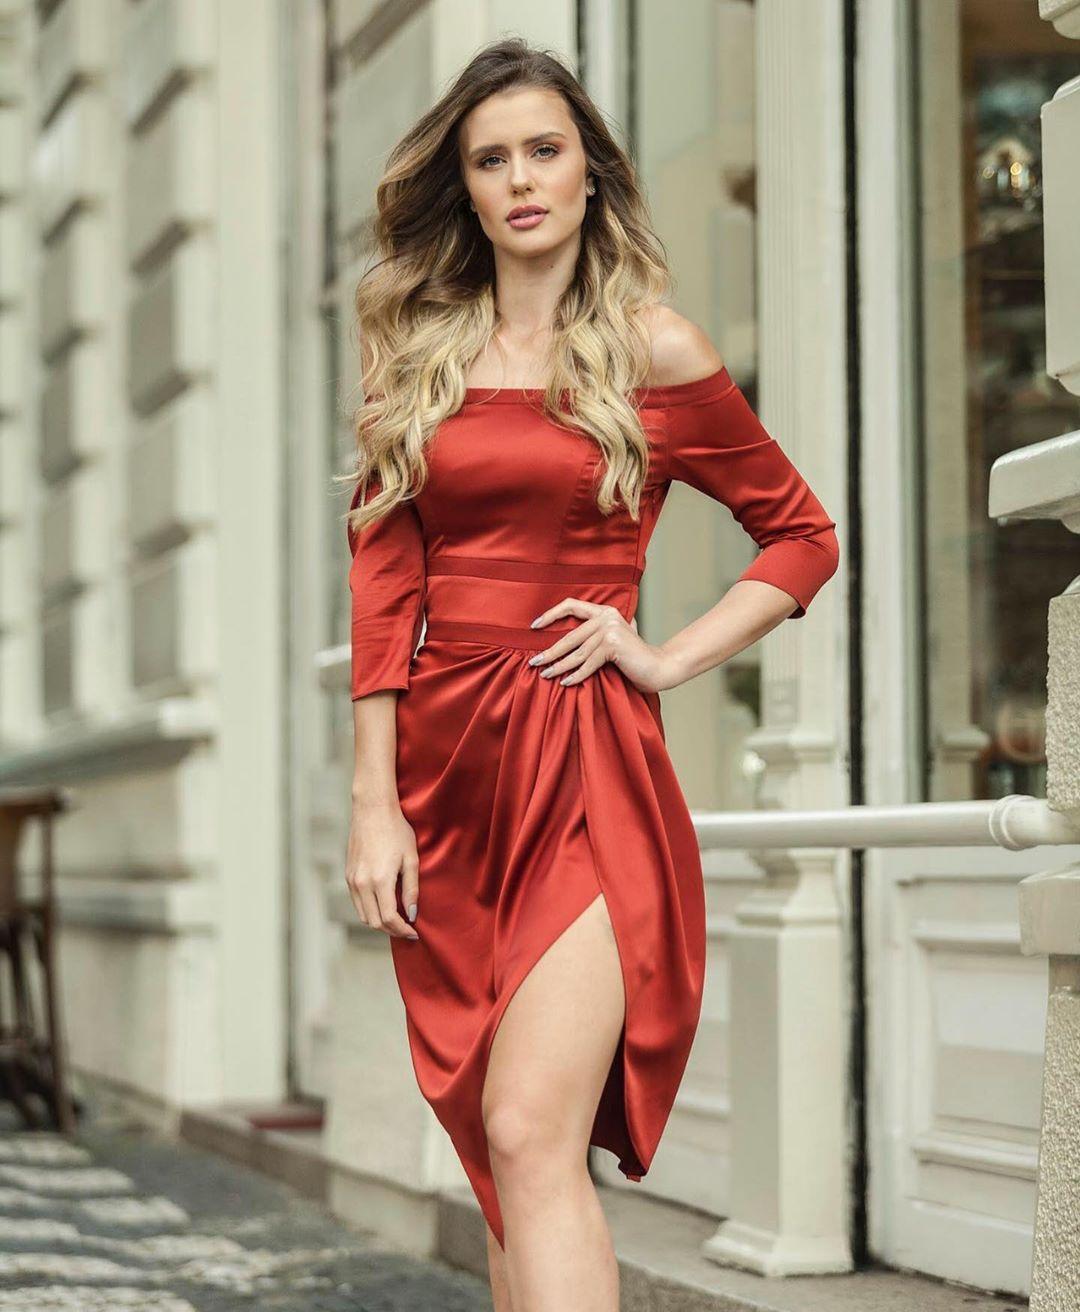 marcella kozinski de barros, 3rd runner-up de miss tourism world 2019. 67316510